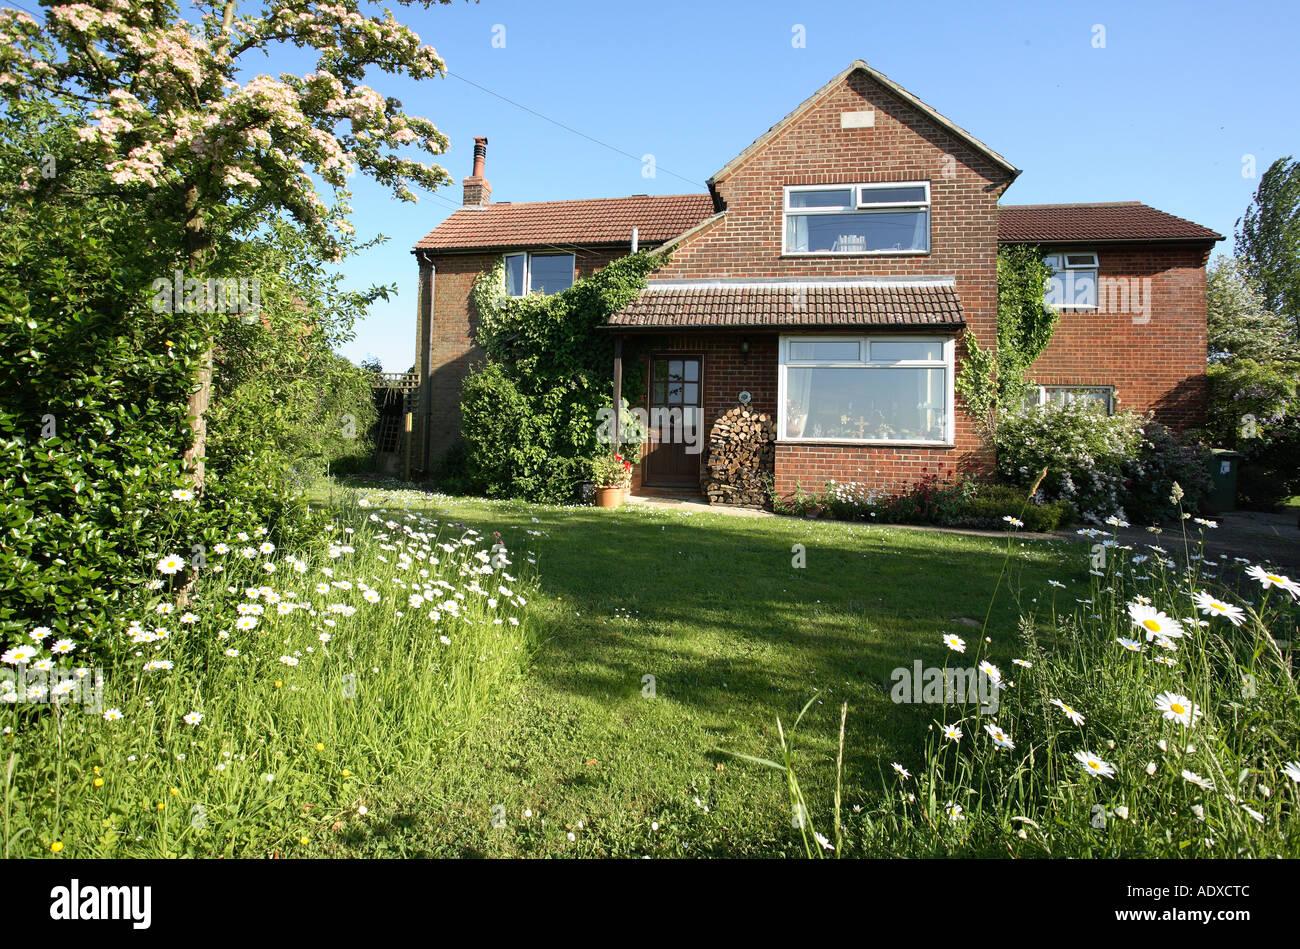 Rural house Hampshire England. - Stock Image